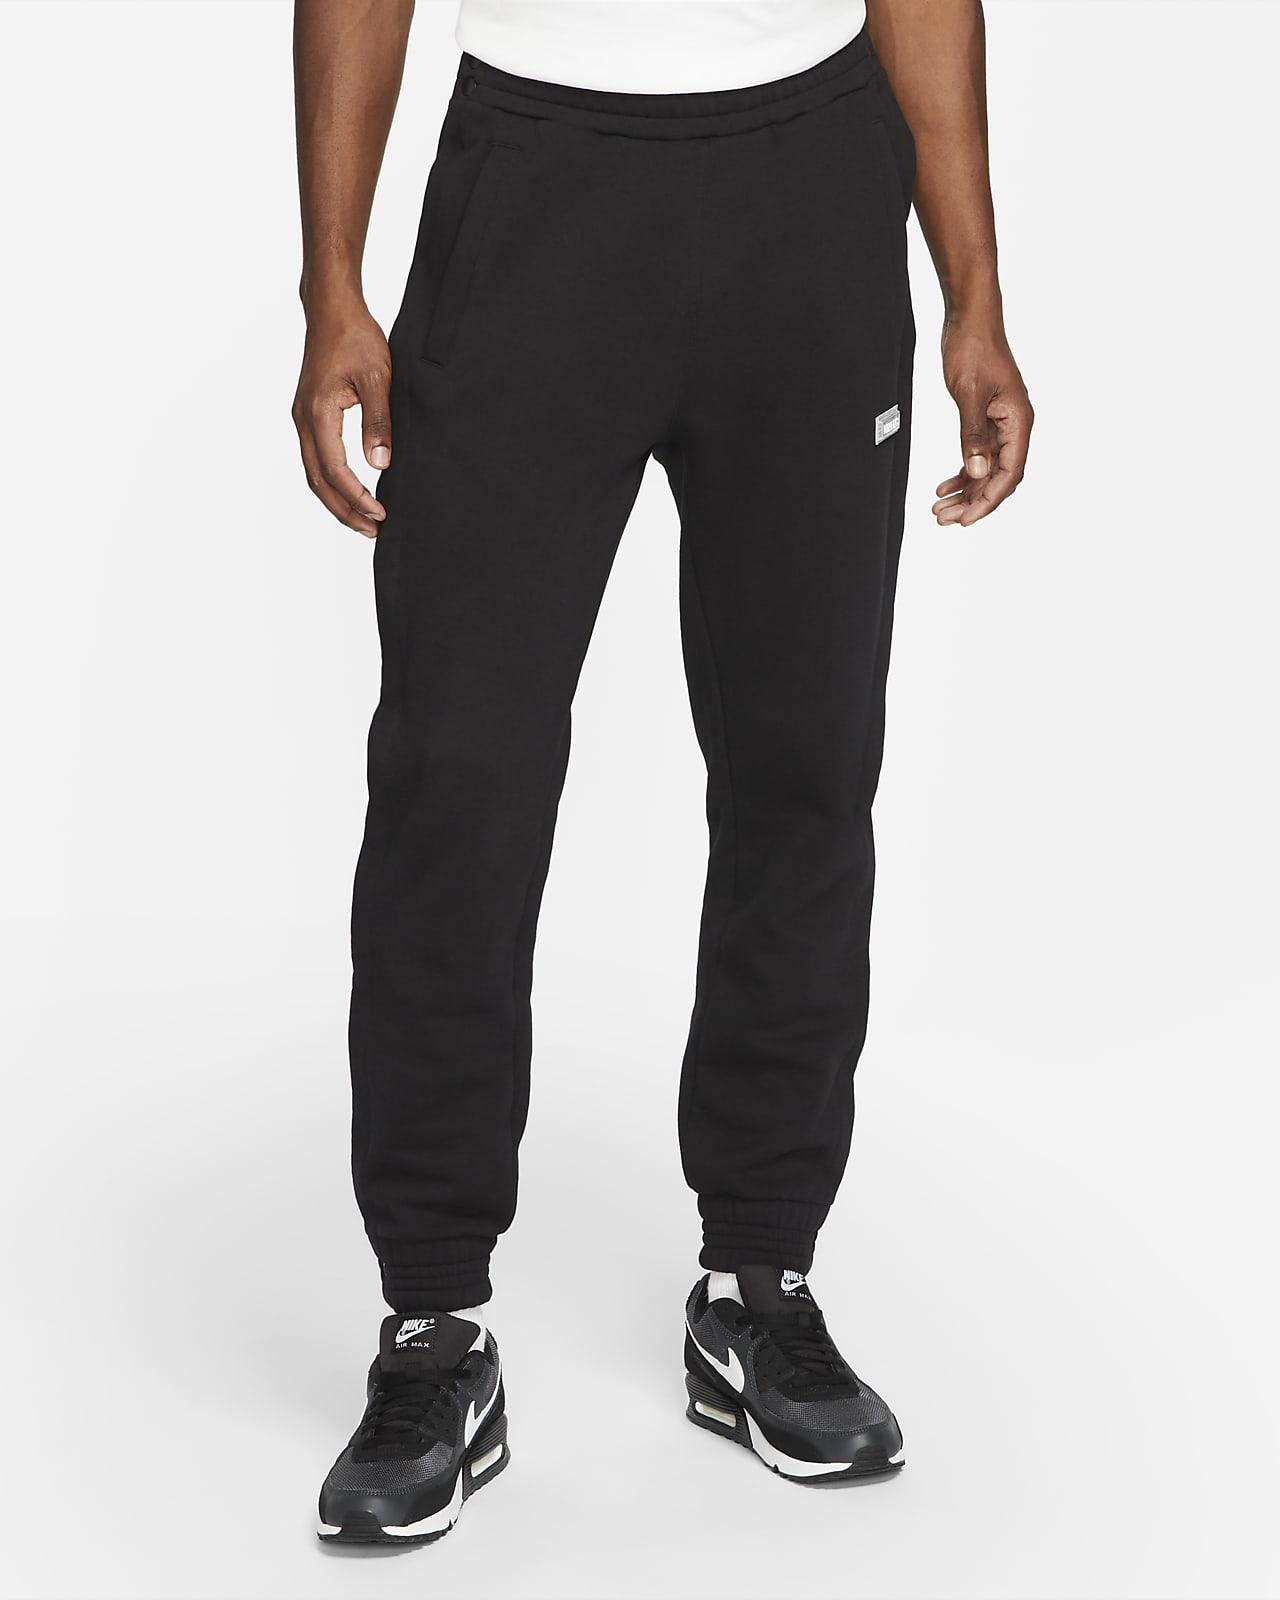 Pantalon de football en tissu Fleece Nike F.C. pour Homme